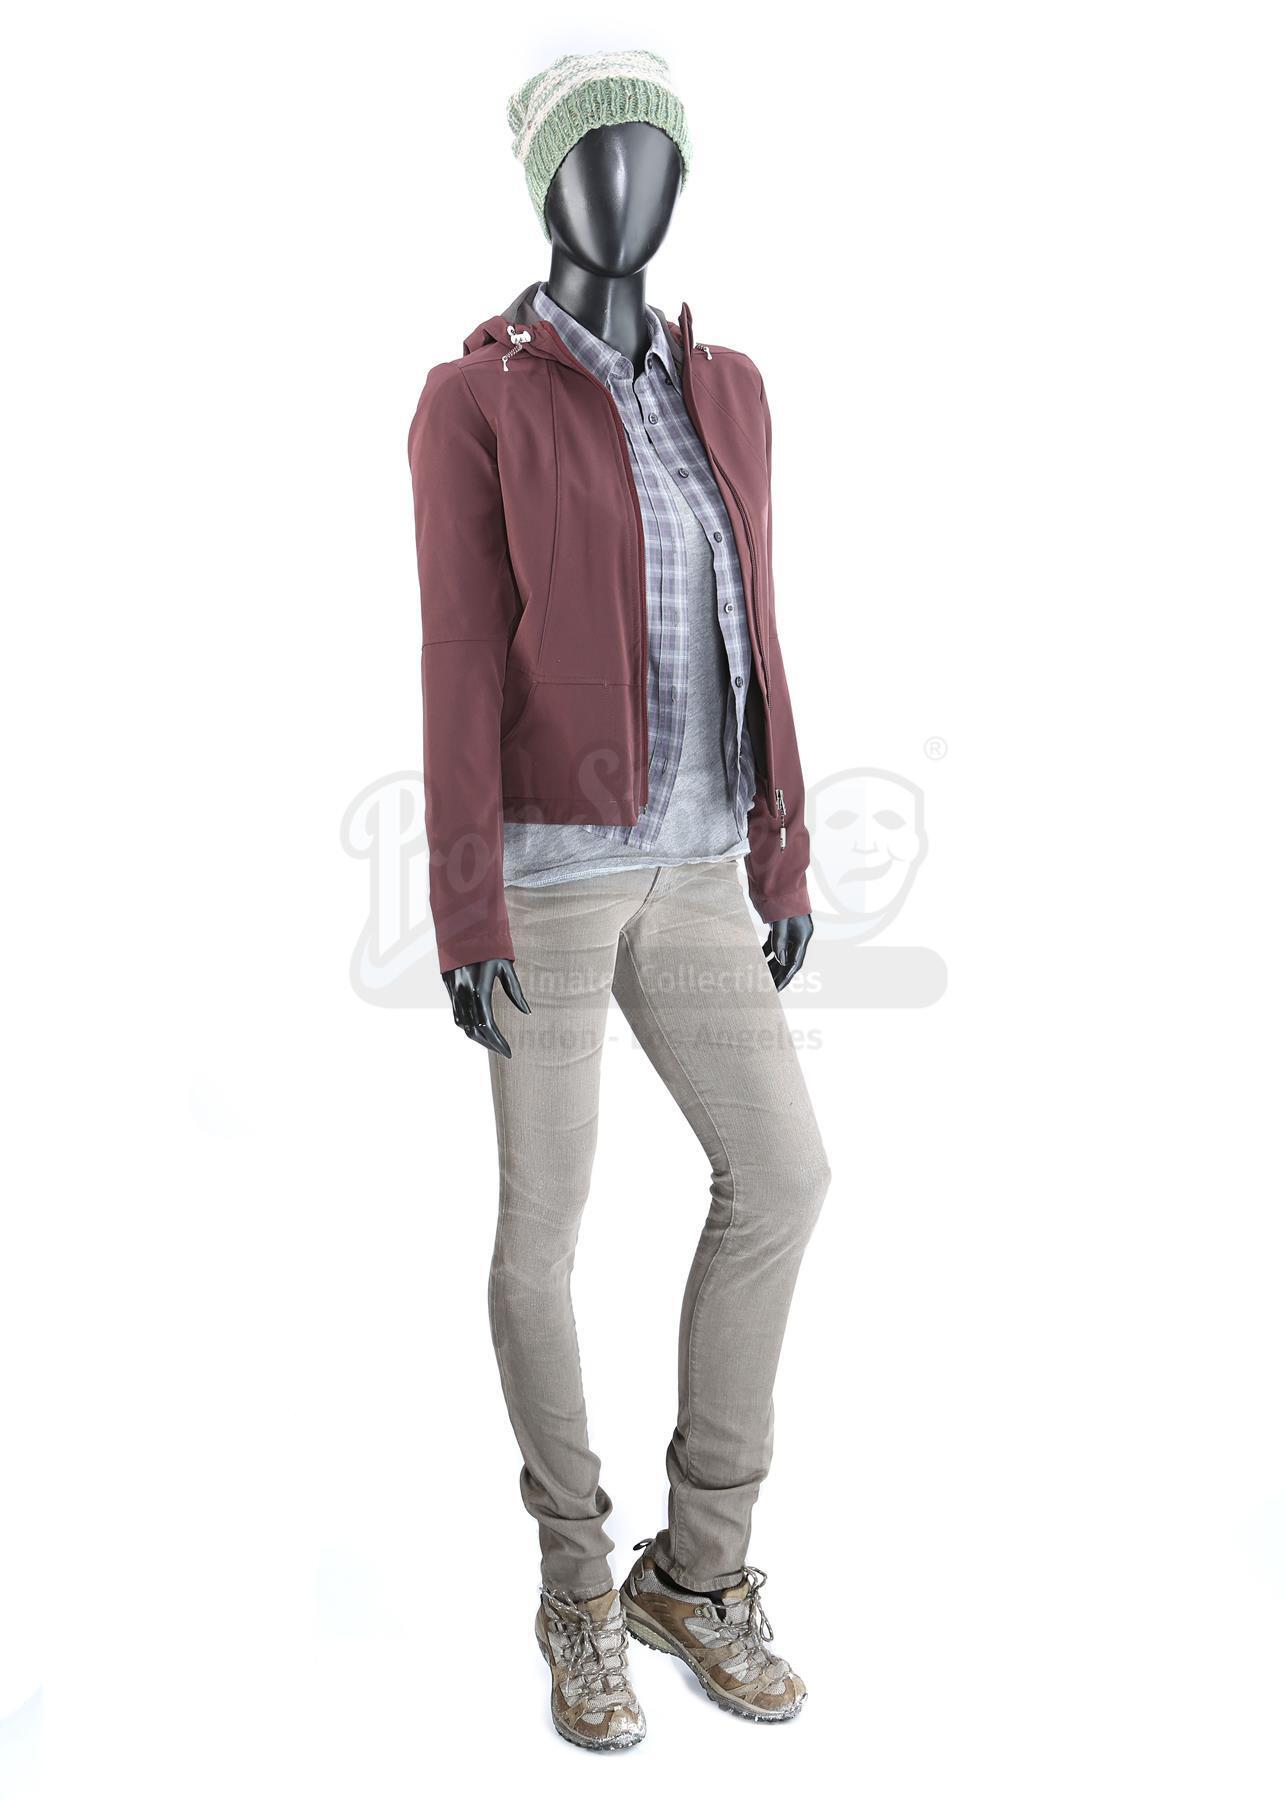 Lot # 1328: THE TWILIGHT SAGA: ECLIPSE - Bella Swan's Hideout Costume